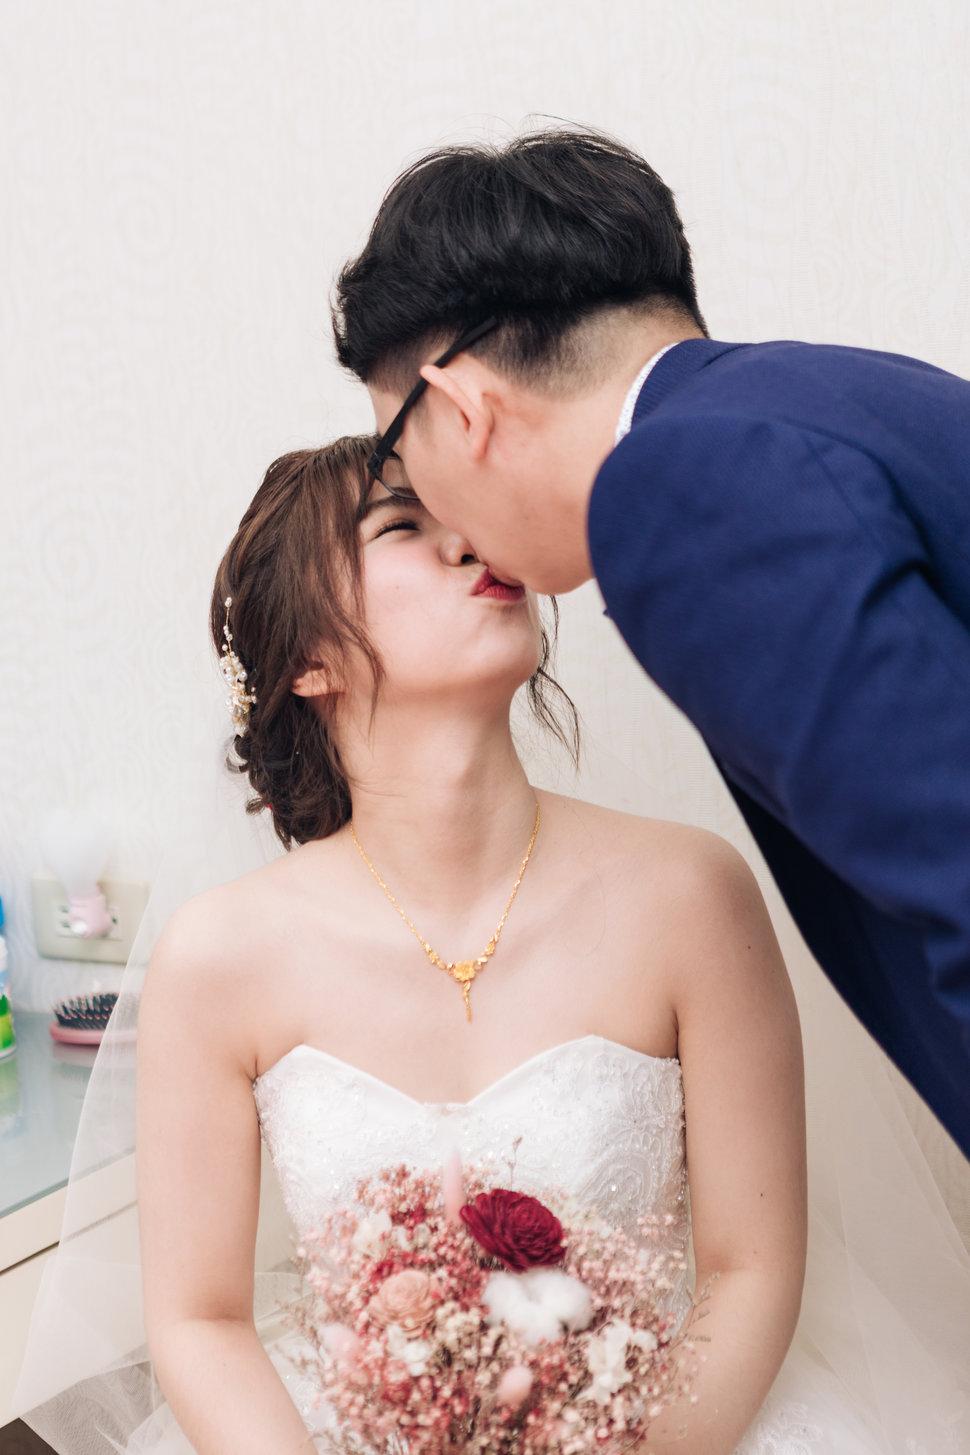 IMG_9176 - syuan影像紀錄 - 結婚吧